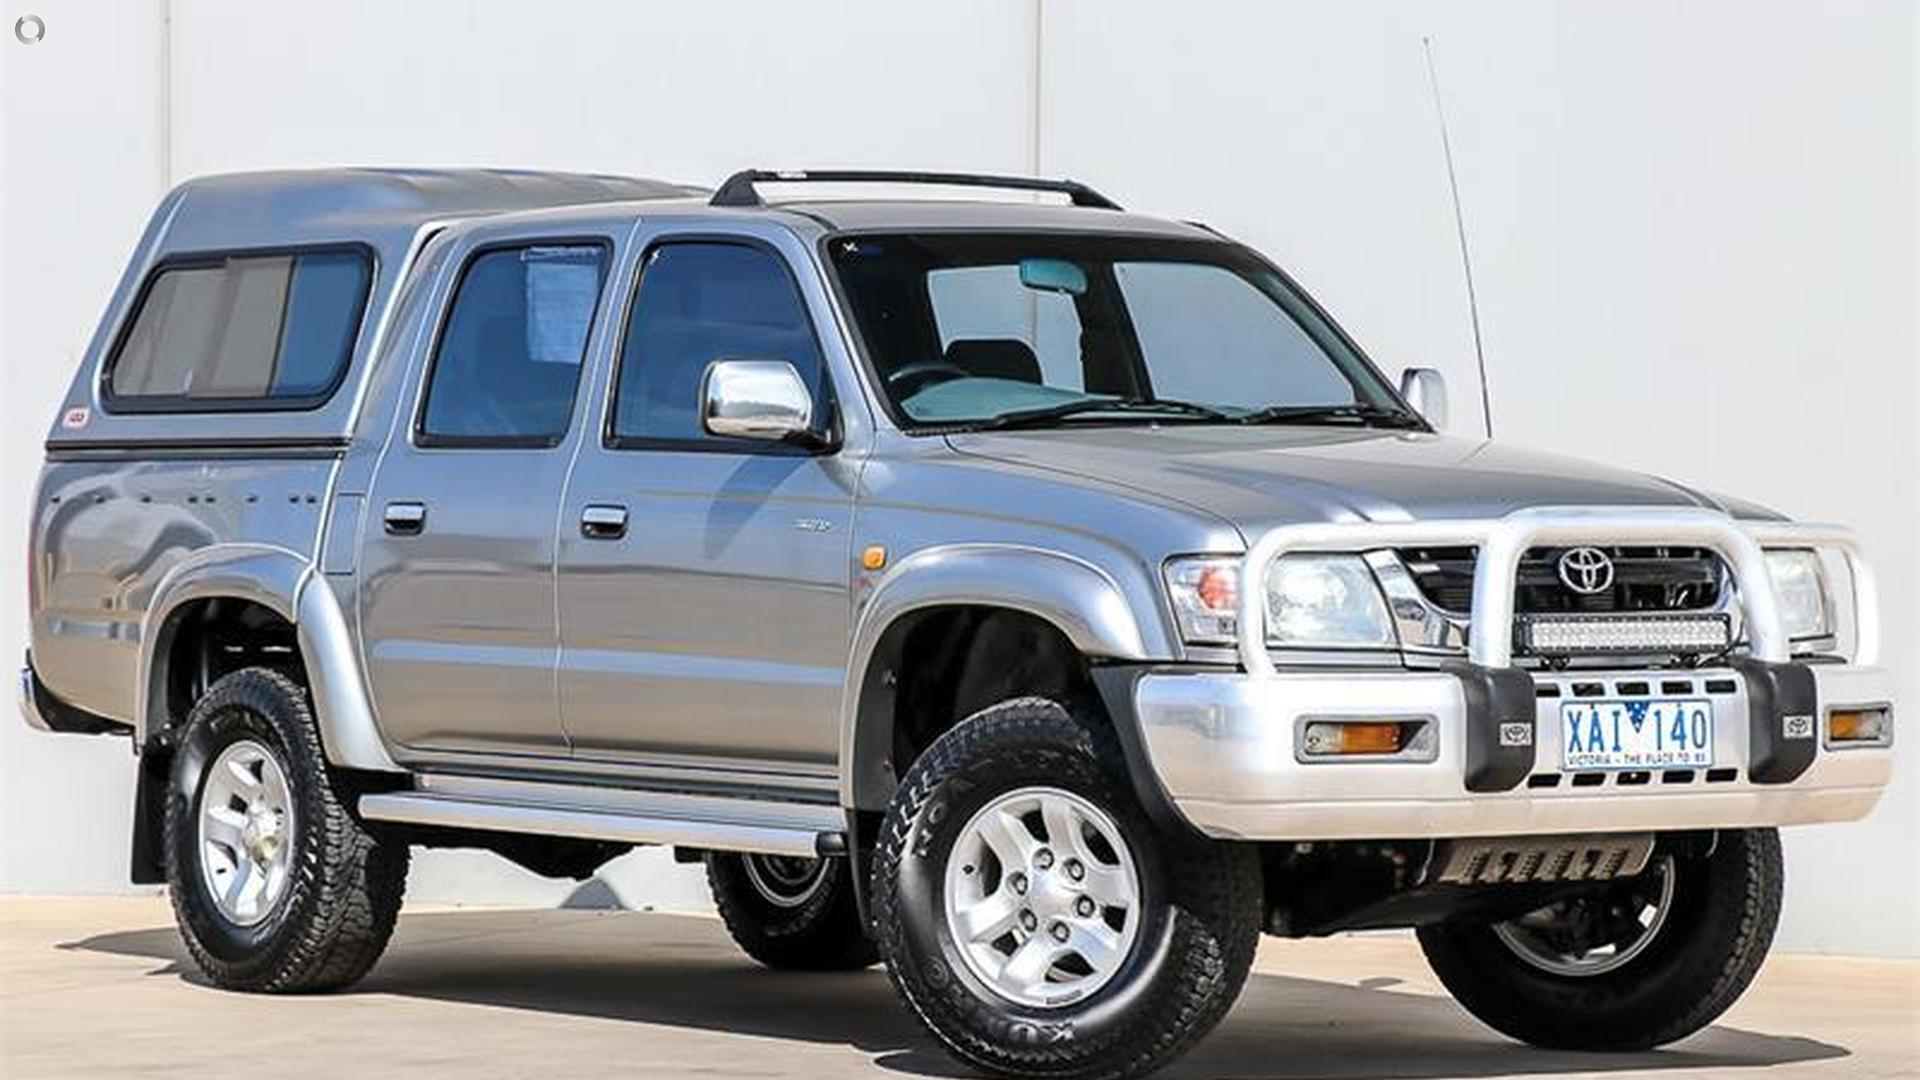 2004 Toyota Hilux SR5 KZN165R